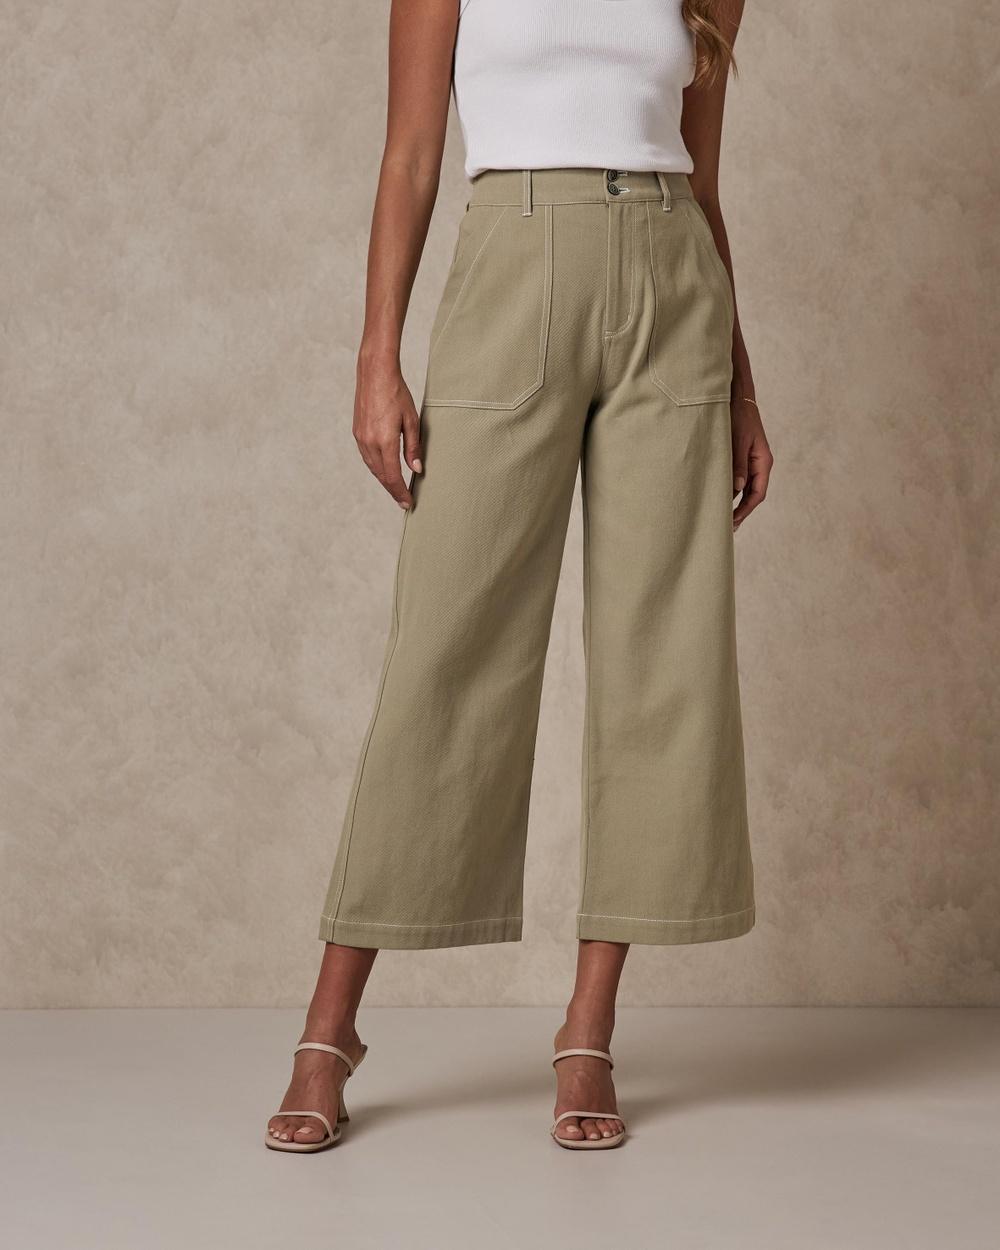 AERE Organic Cotton Canvas Pants Green